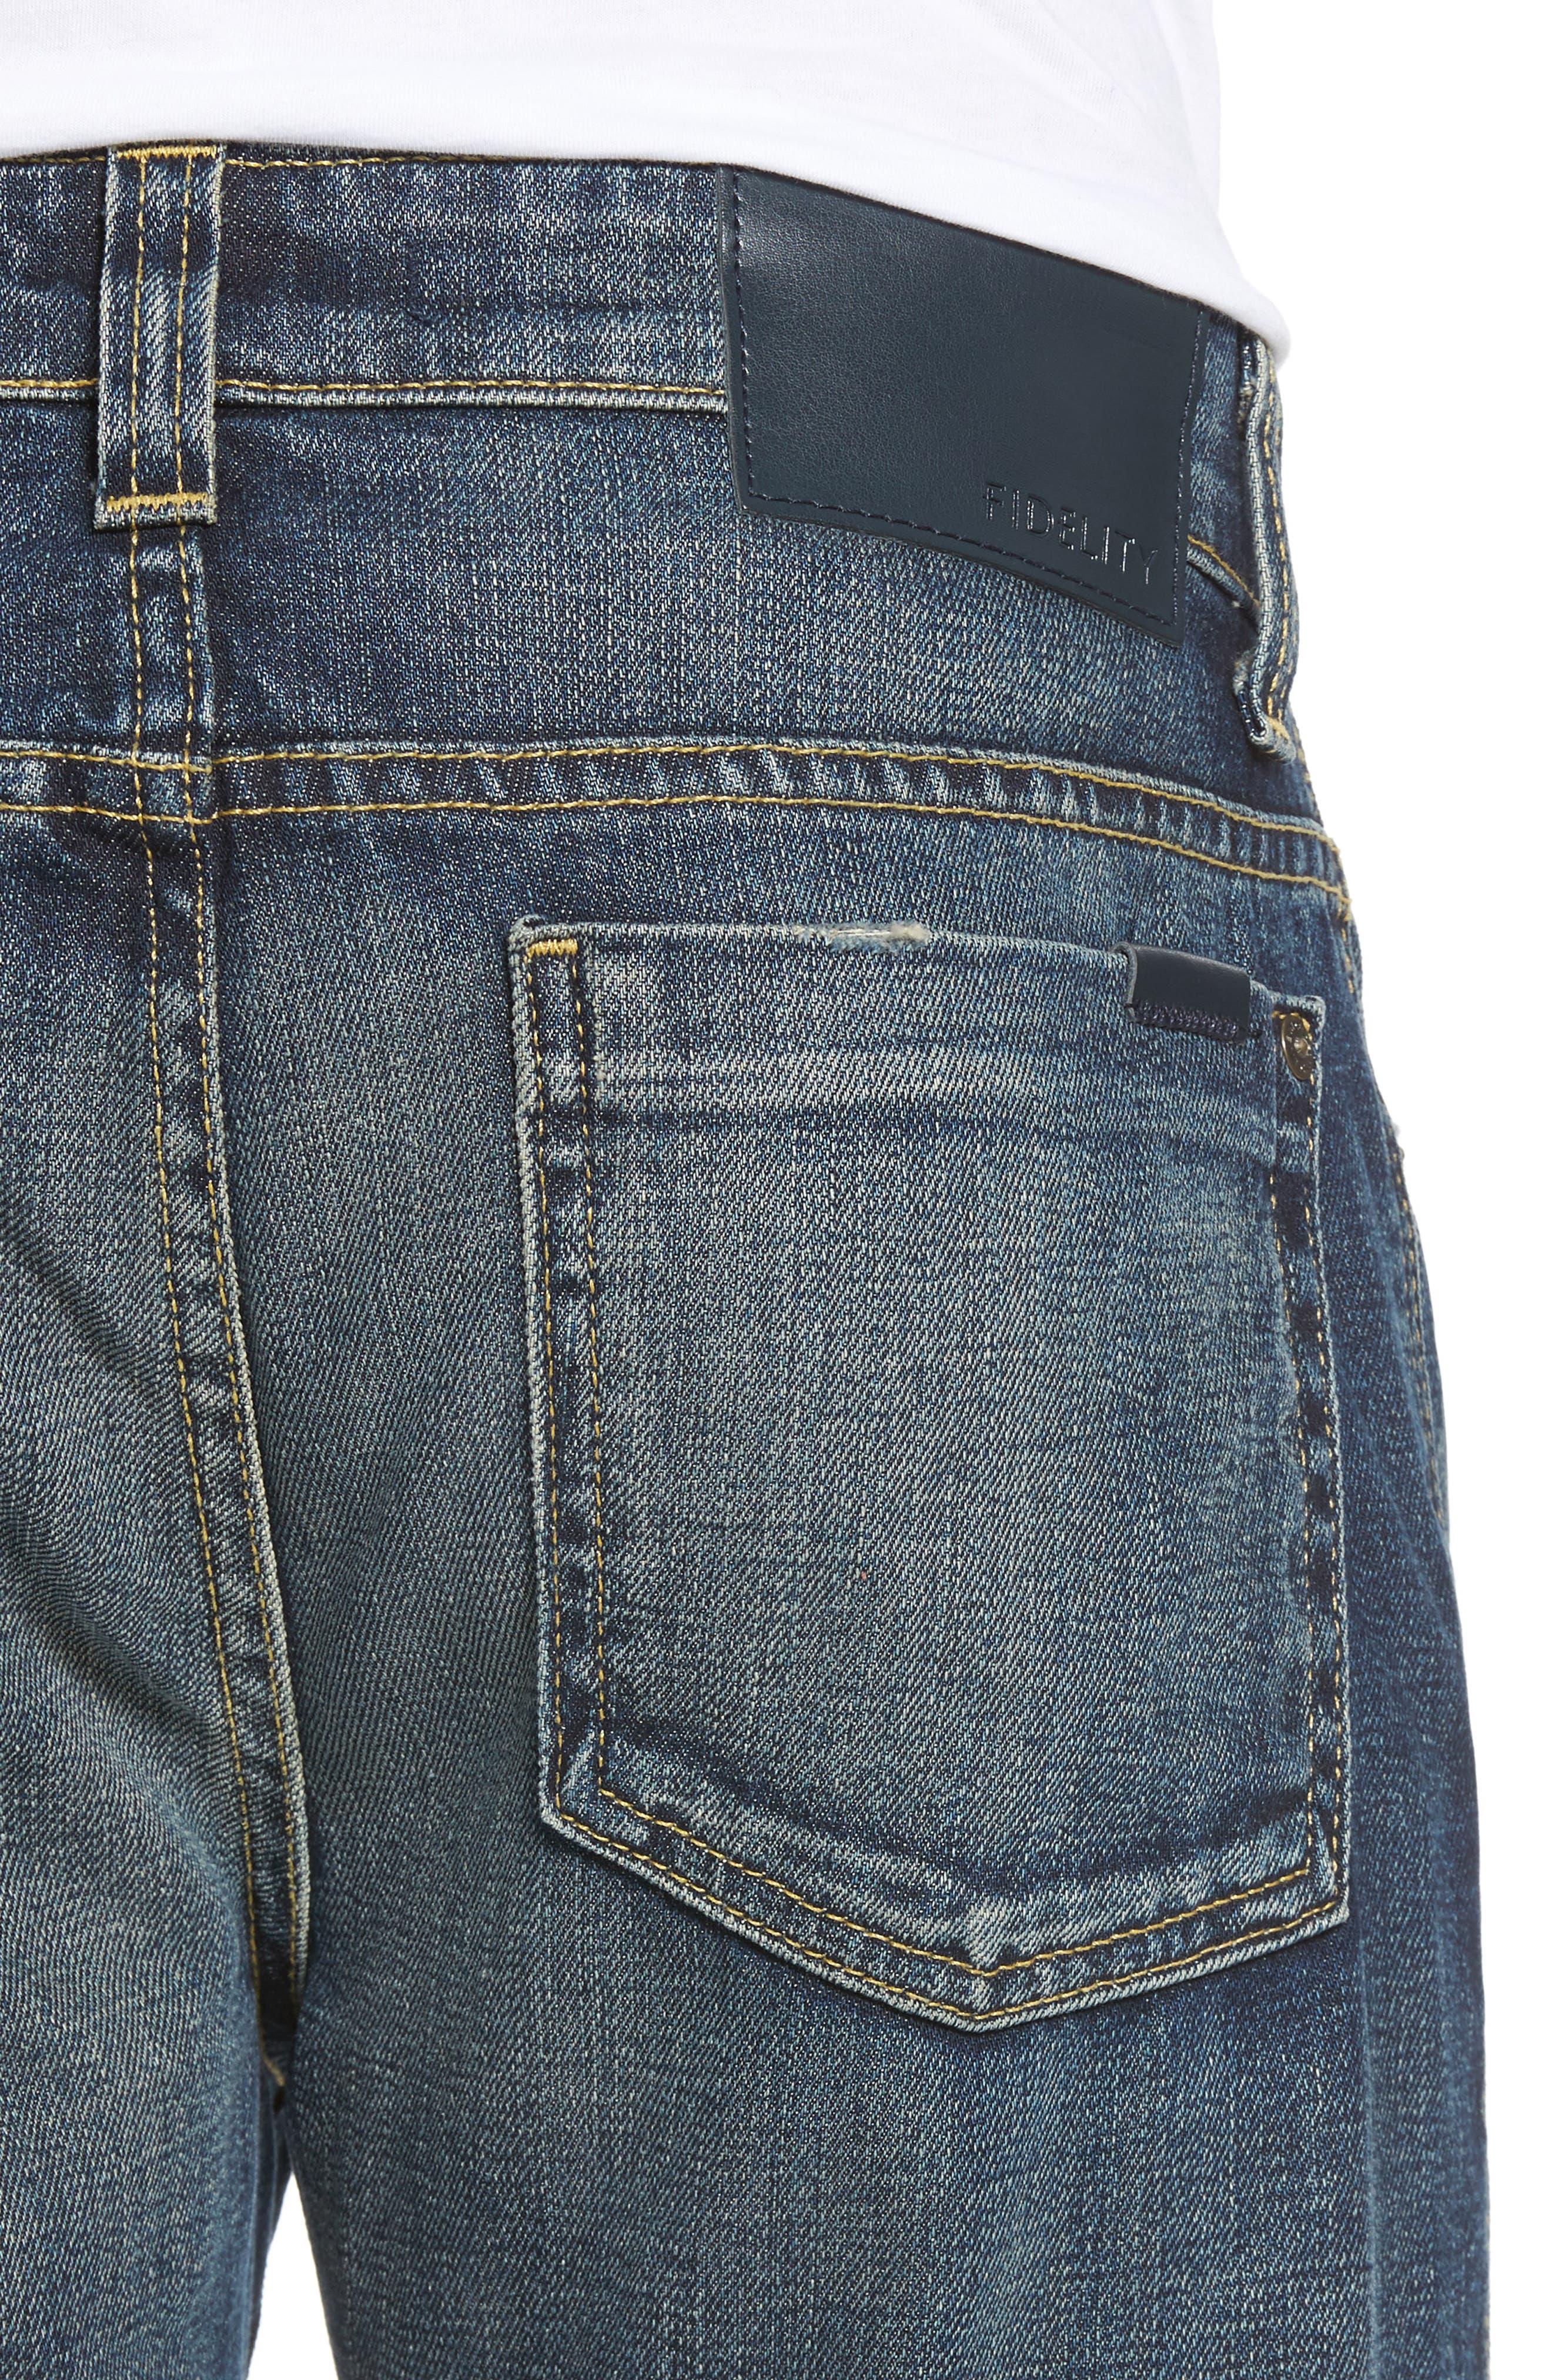 Fideltiy Denim Torino Slim Fit Jeans,                             Alternate thumbnail 4, color,                             Crystal Blue